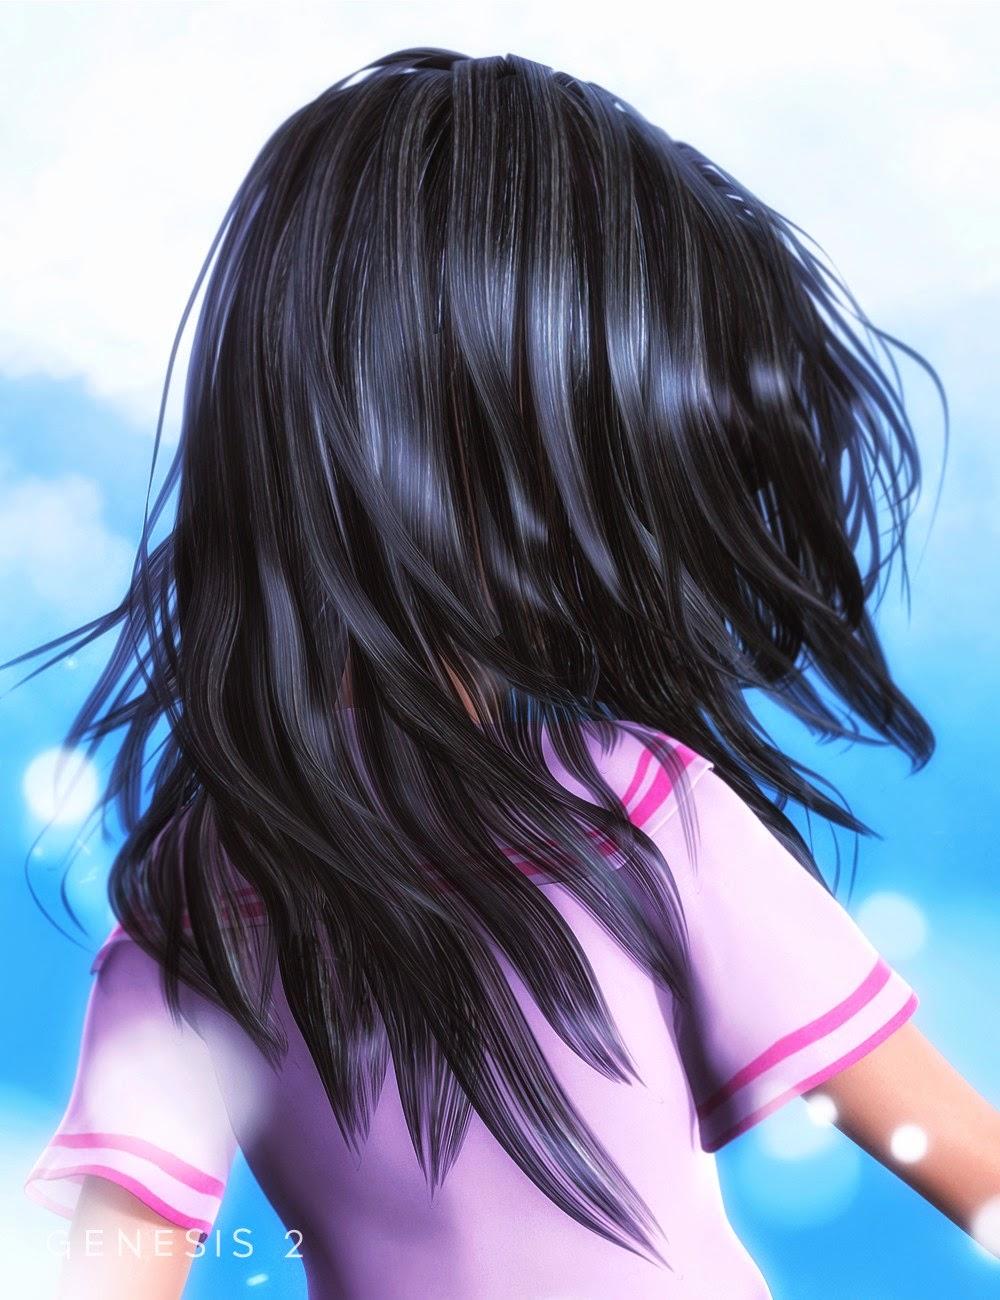 Koko cheveux pour Genesis 2 Femme